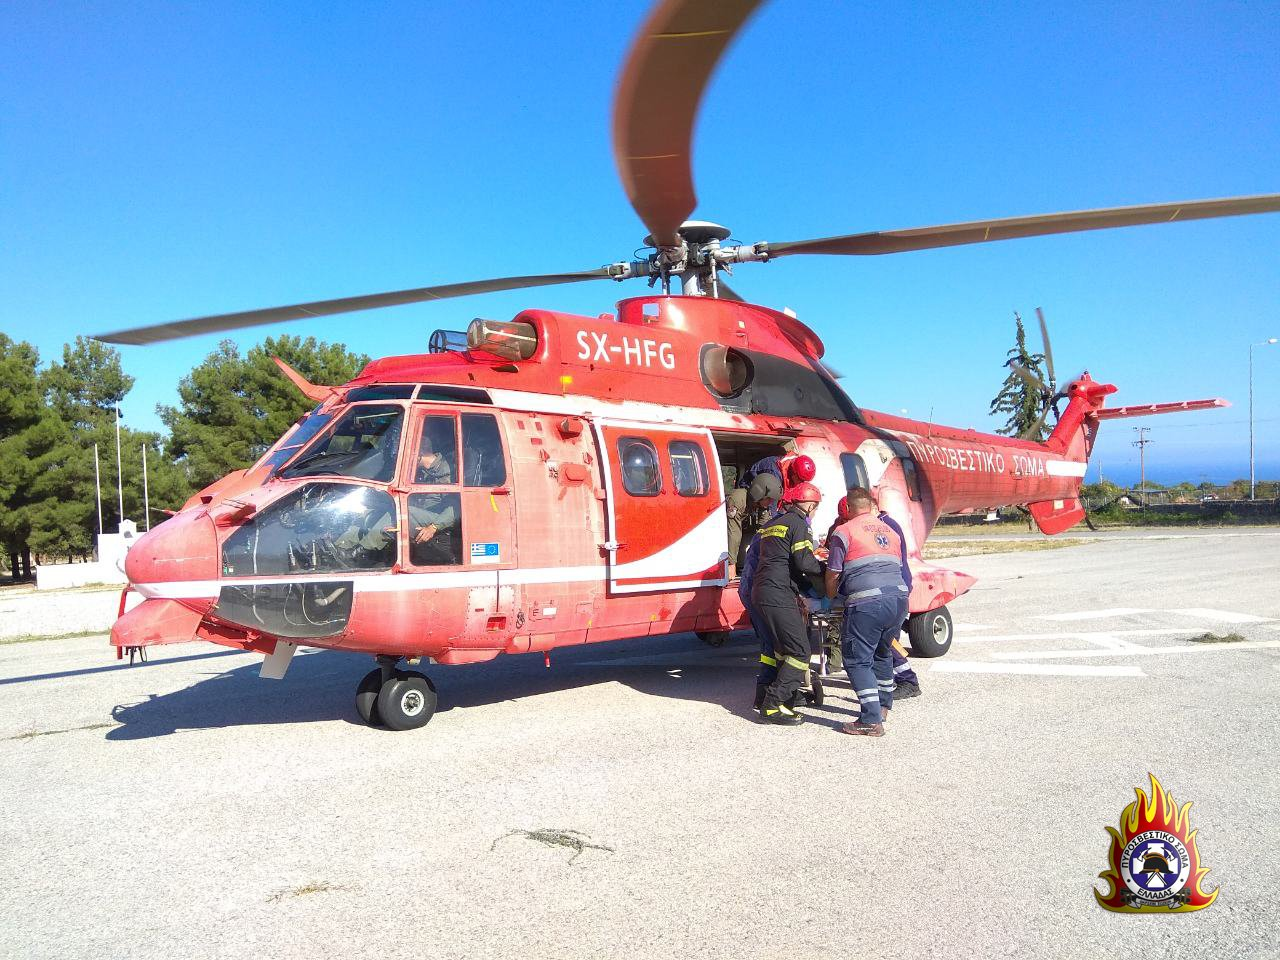 EFjobZWWwAA3ux4 - Η δραματική επιχείρηση διάσωσης του ορειβάτη γιατρού στον Όλυμπο (φωτο)